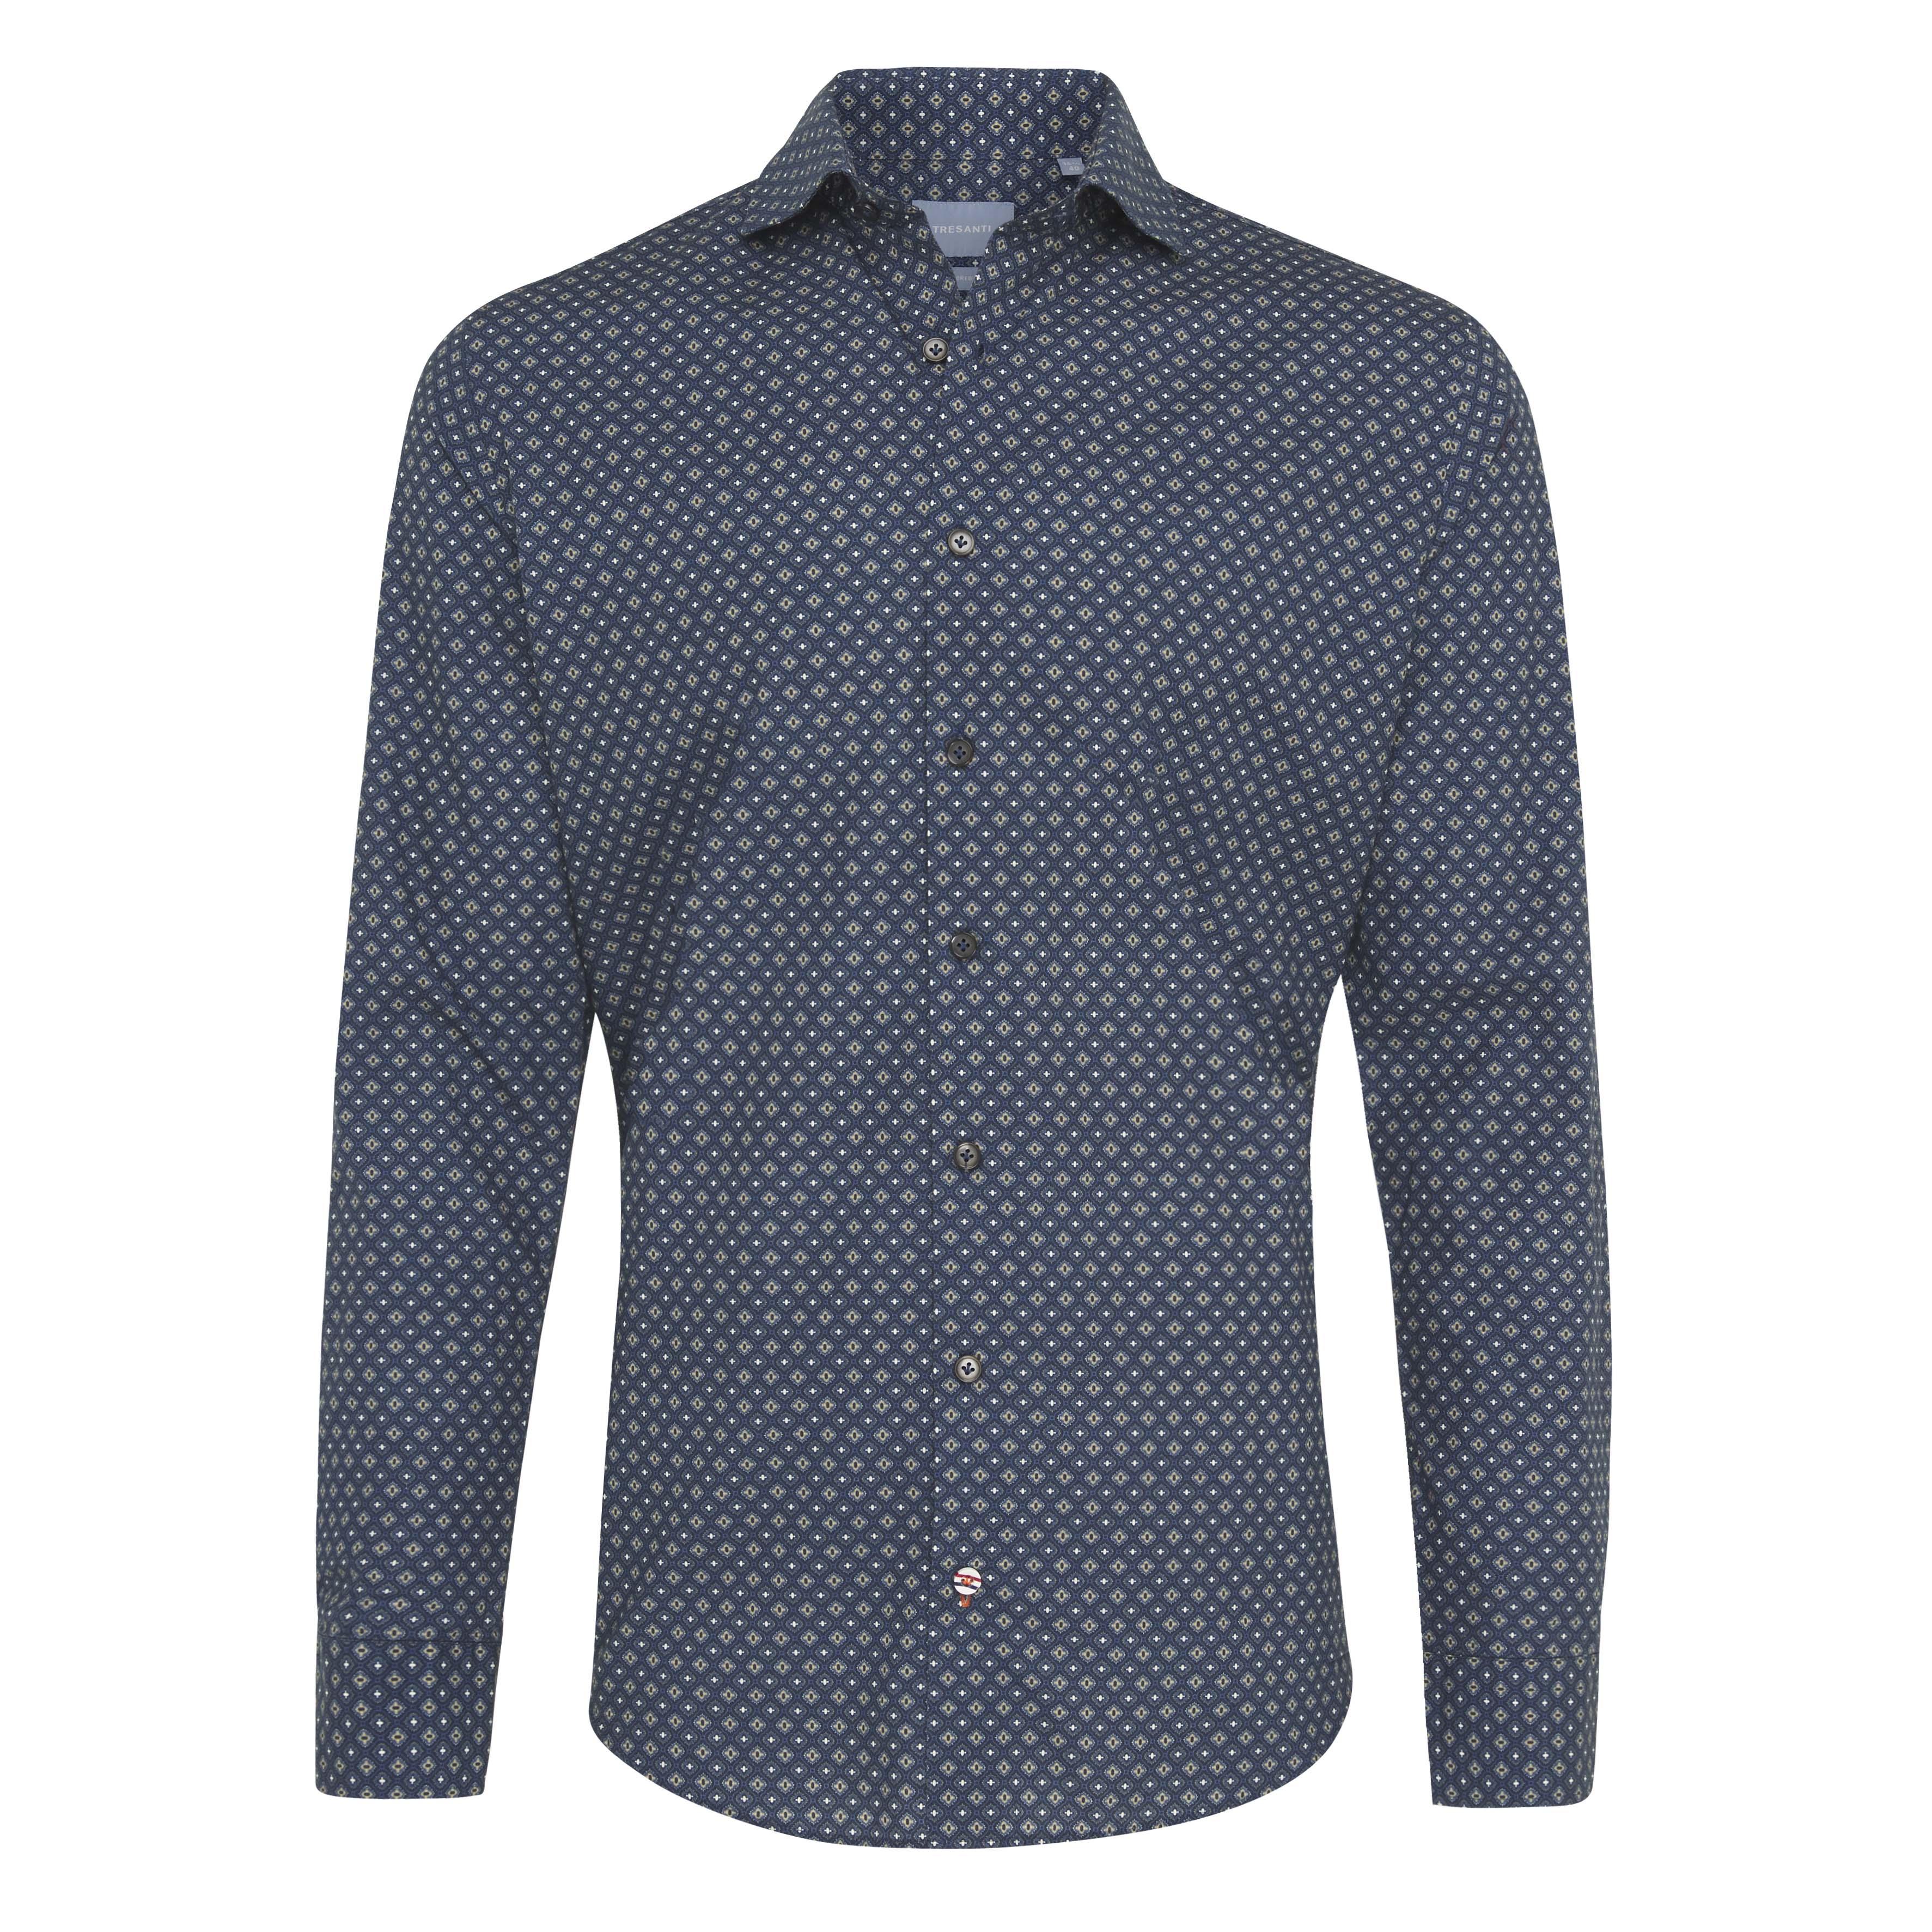 Jermo | Shirt classic print